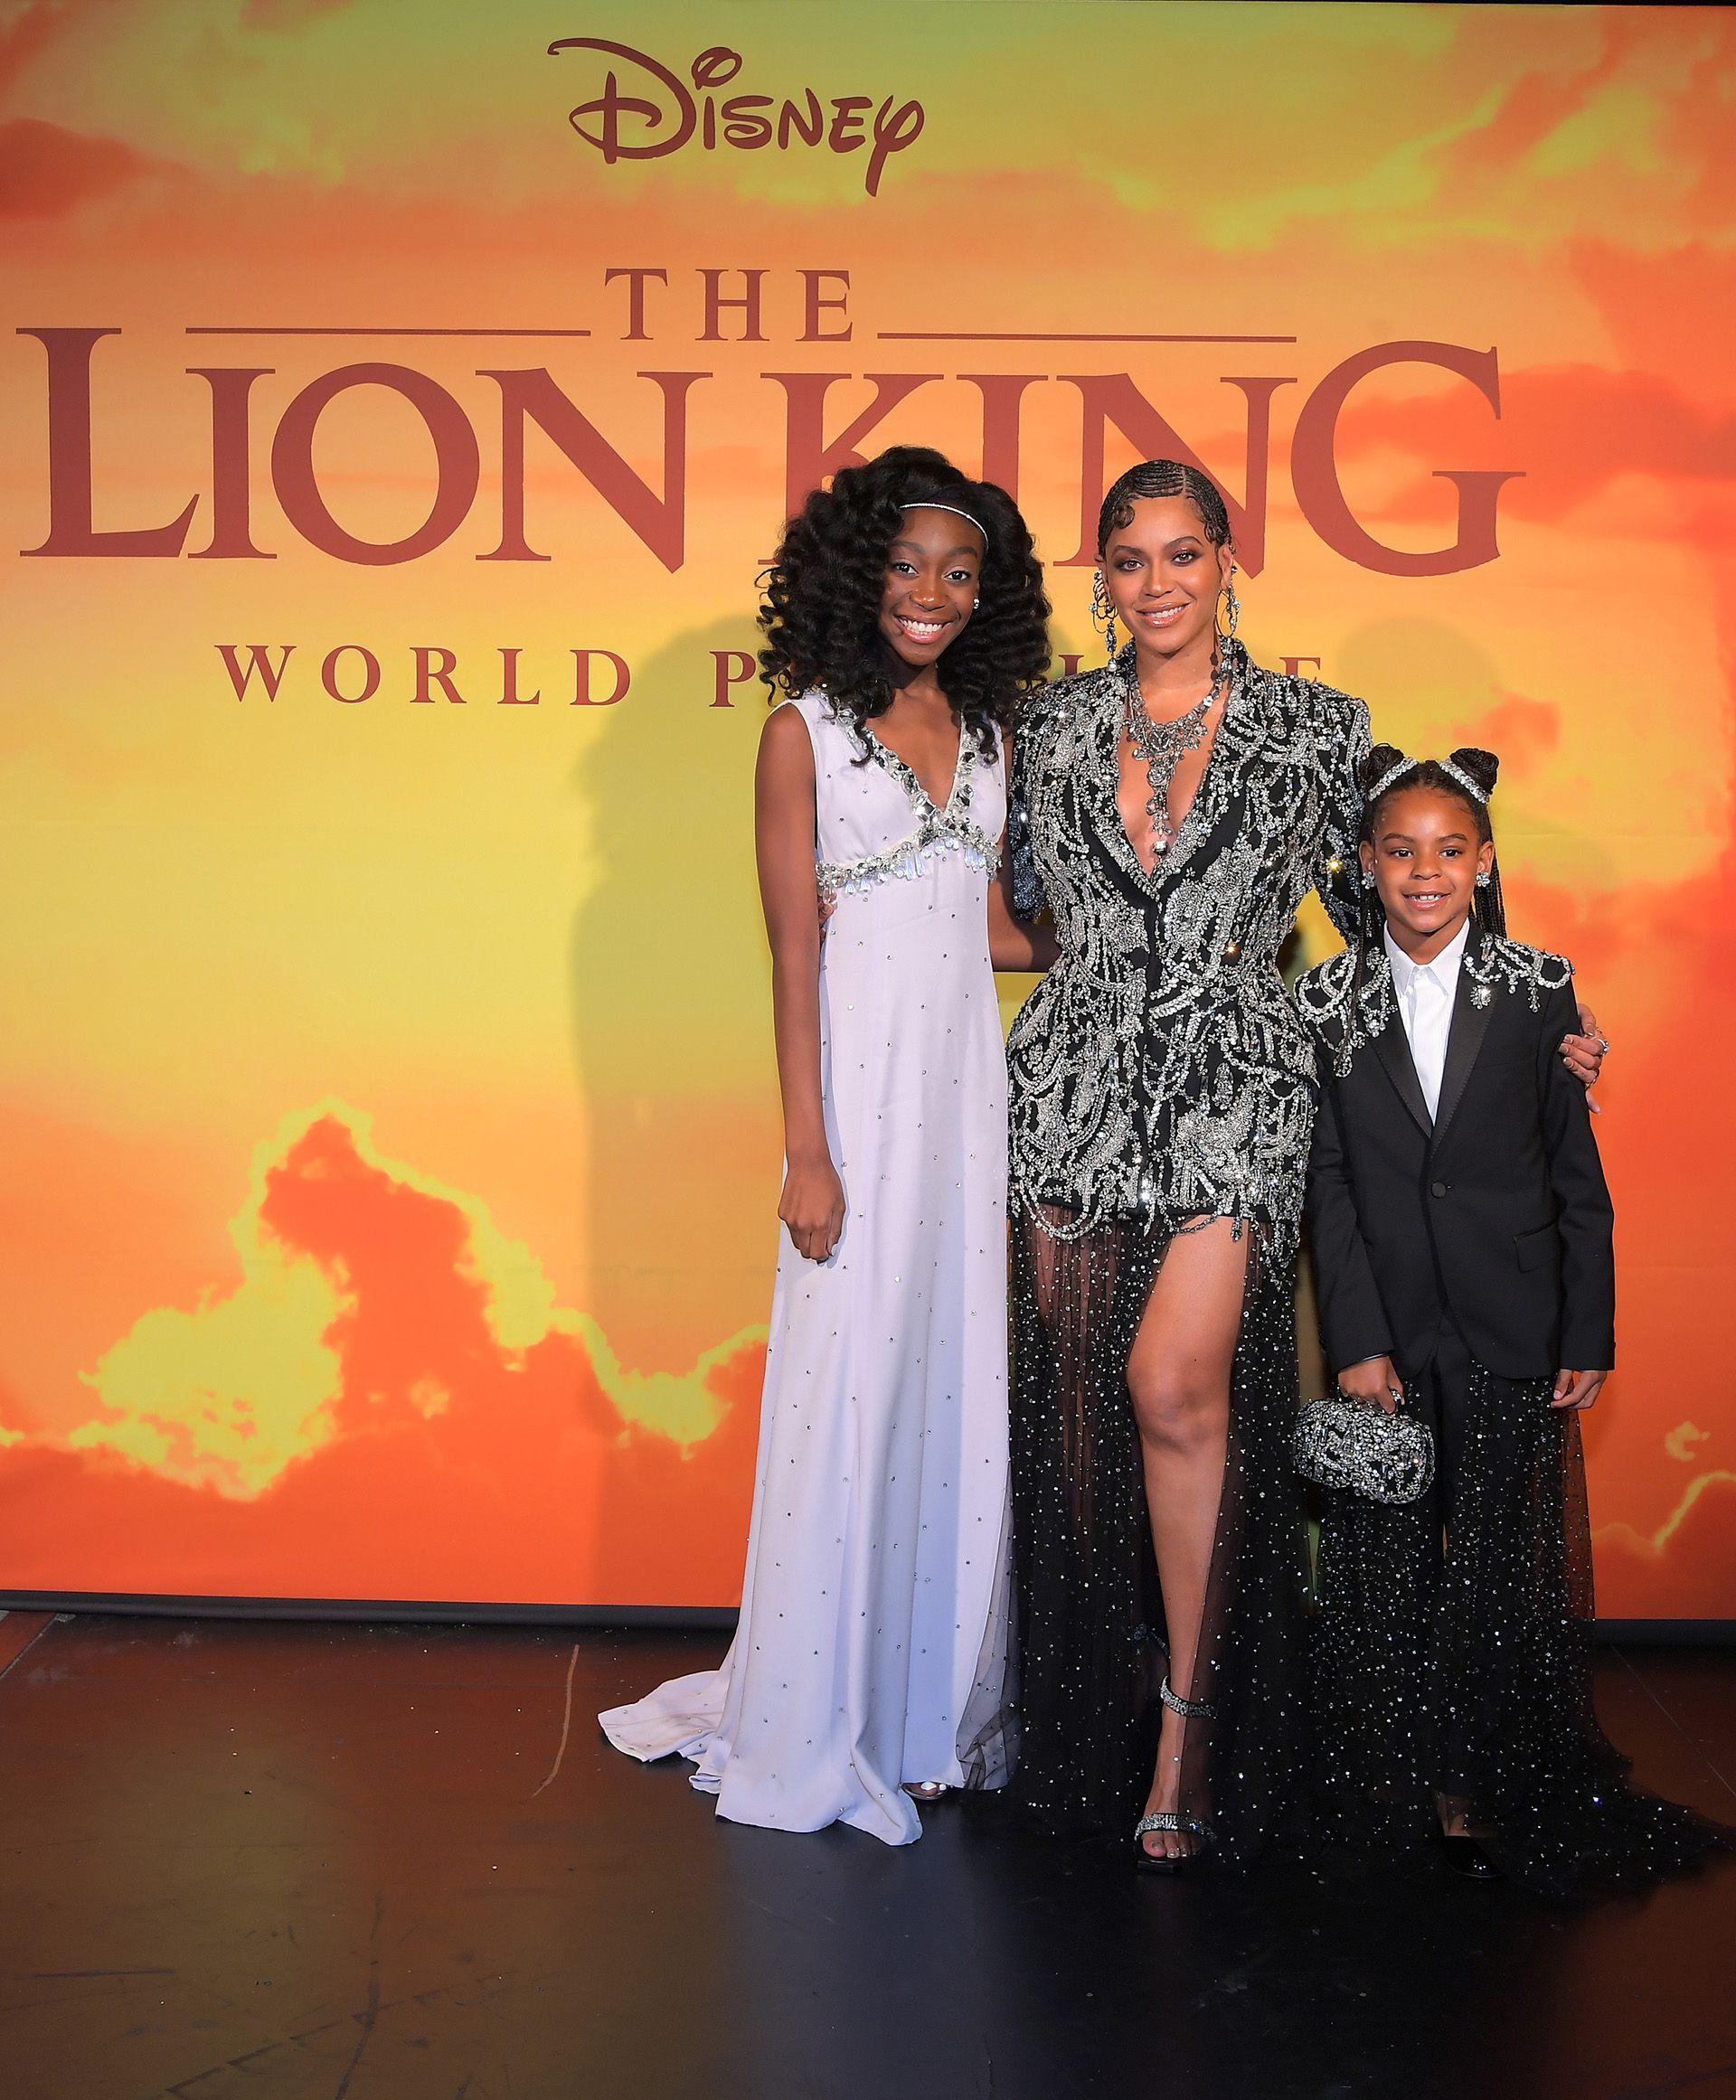 Shahadi Wright Joseph, Beyonce Knowles-Carter,y Blue Ivy Carter